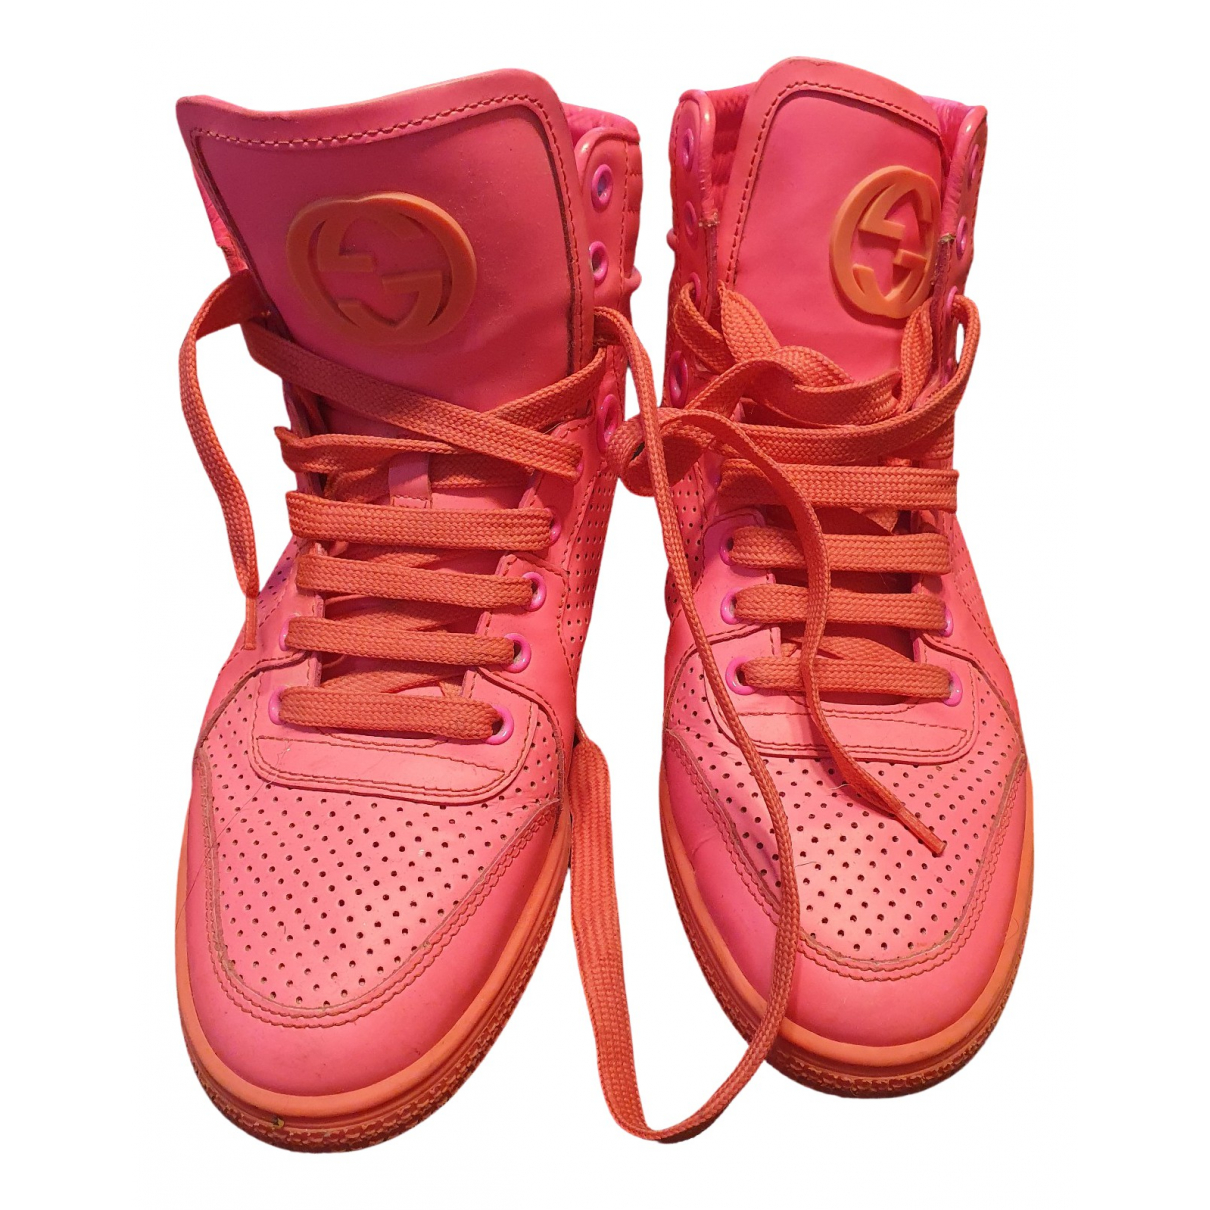 Gucci Gucci Dapper Dan Sneakers in  Rosa Leder